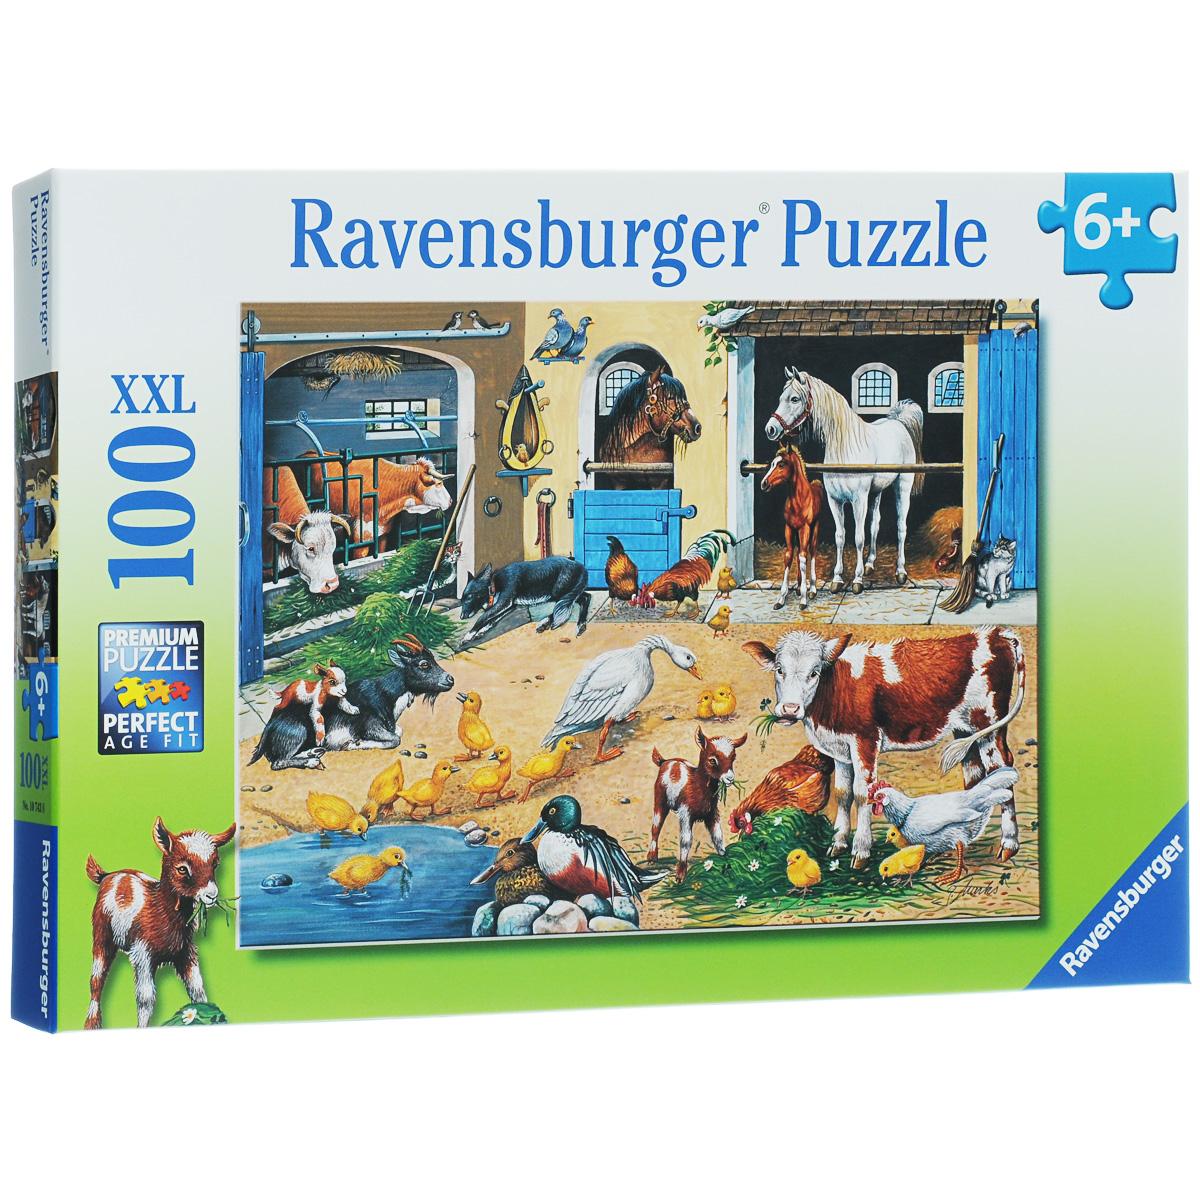 Ravensburger ����� �������� ��������. ���� XXL, 100 ��������� - Ravensburger10743���� Ravensburger ����� �������� �������� ����������� ���������� ������ �������. ������ ���� ����, ���������� � ���� 100 ������� ���������, �� �������� ������������� �������� � ������������ �������� ��������. ���� ���������� �� ������� ����������� ��������. ������ ������ ����� ���� ����� � �������� ������ �� ���� �����. ����� - ������������� ����������� ���� ��� �����. ��������� ����� ��������� � ������� ������ �������� ���, ��������� ����������������, ���������� ��������, �������� � ���������� �����, � ������ � �������������� �������, ���� ����������� � ��������, ������������ � ��������.